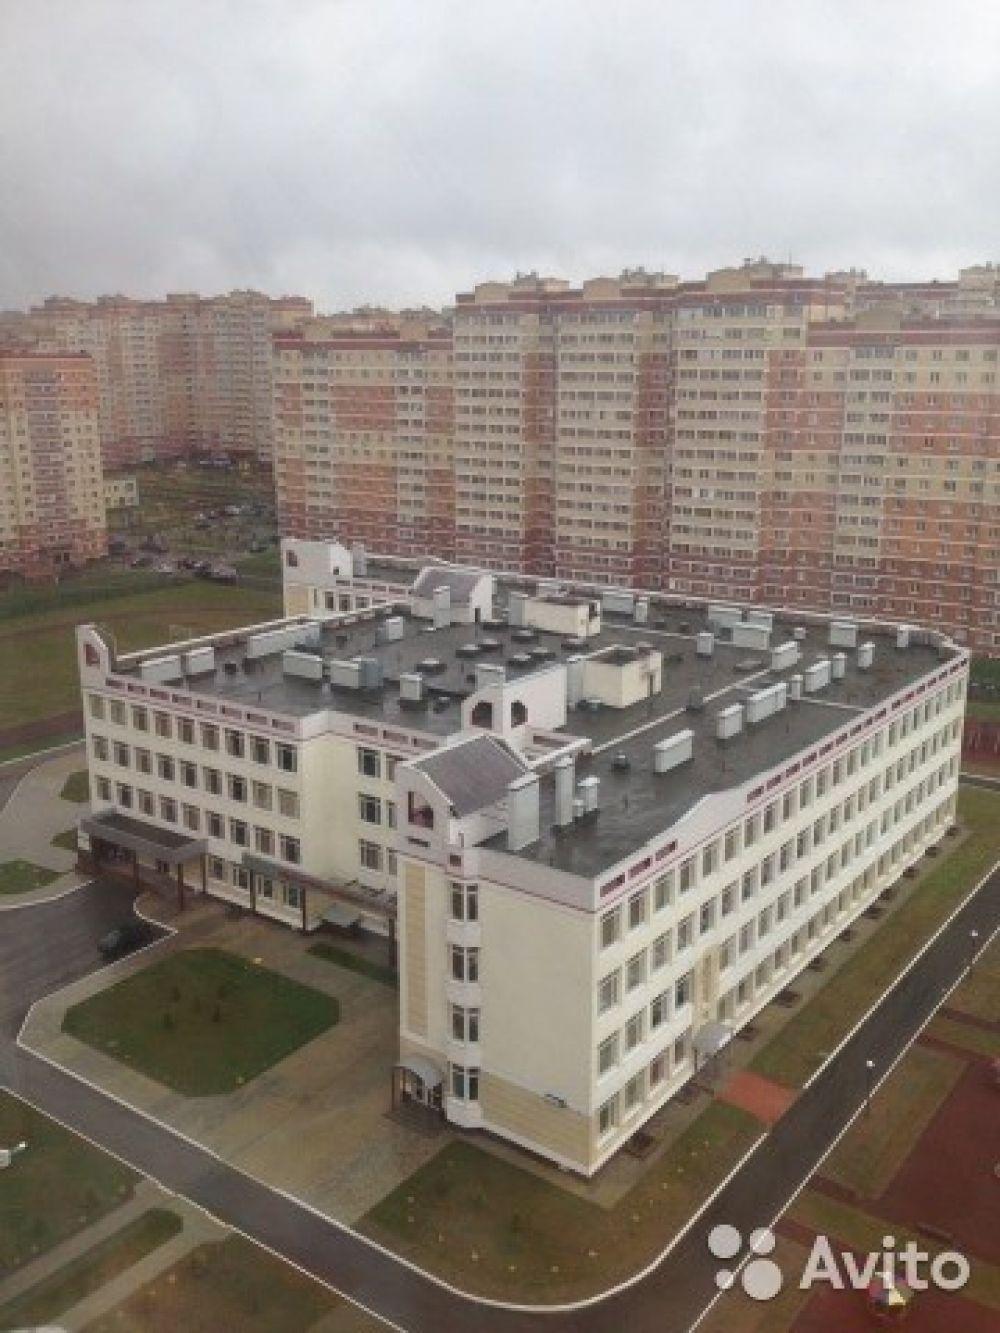 Однокомнатная квартира 42.4 м2,  г. Щелково, Богородский д.3, фото 2